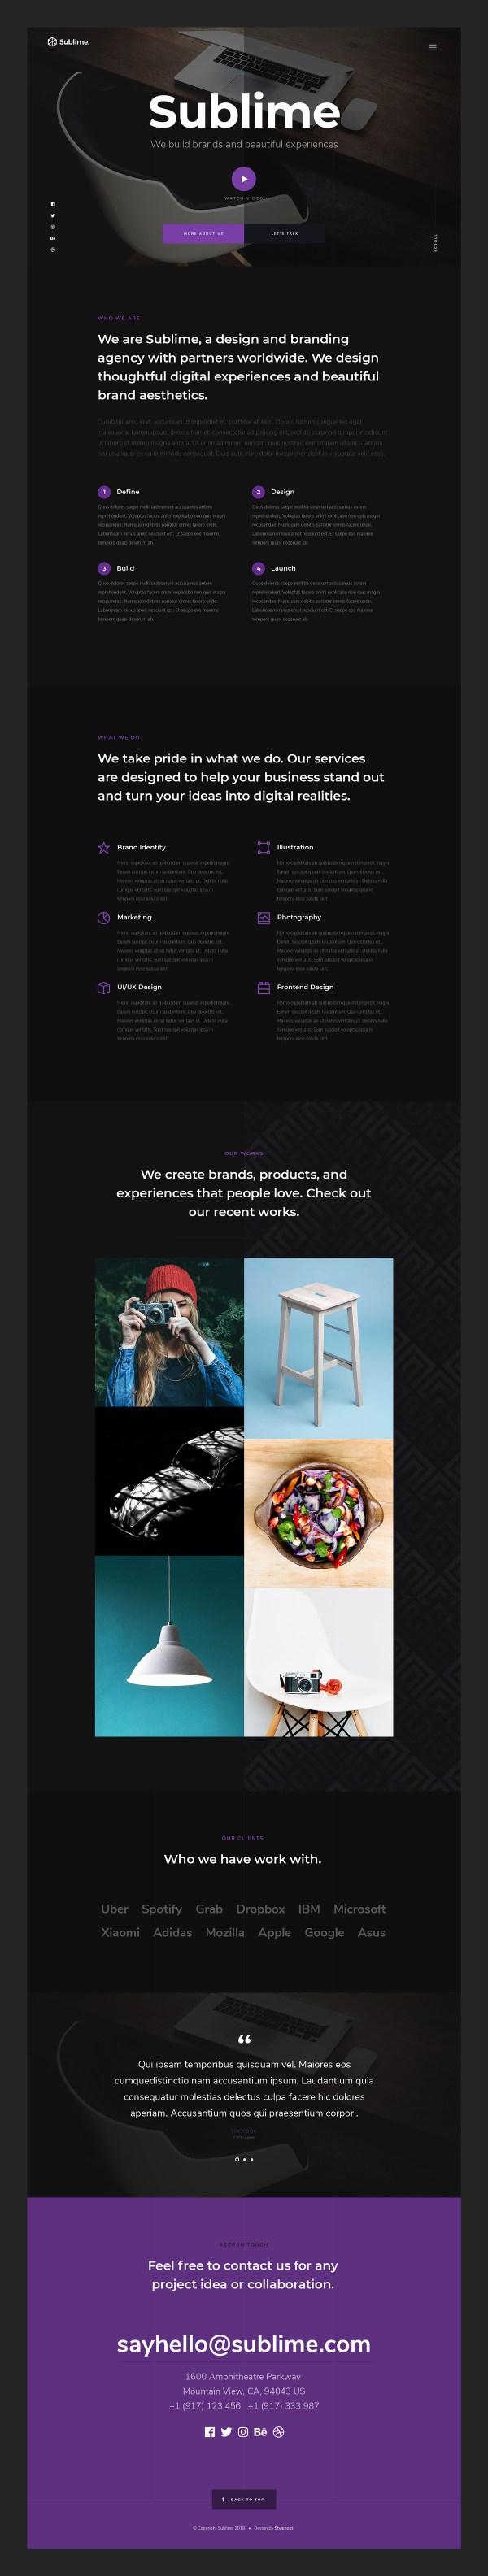 Sublime - Agency Portfolio Free PSD Template 02